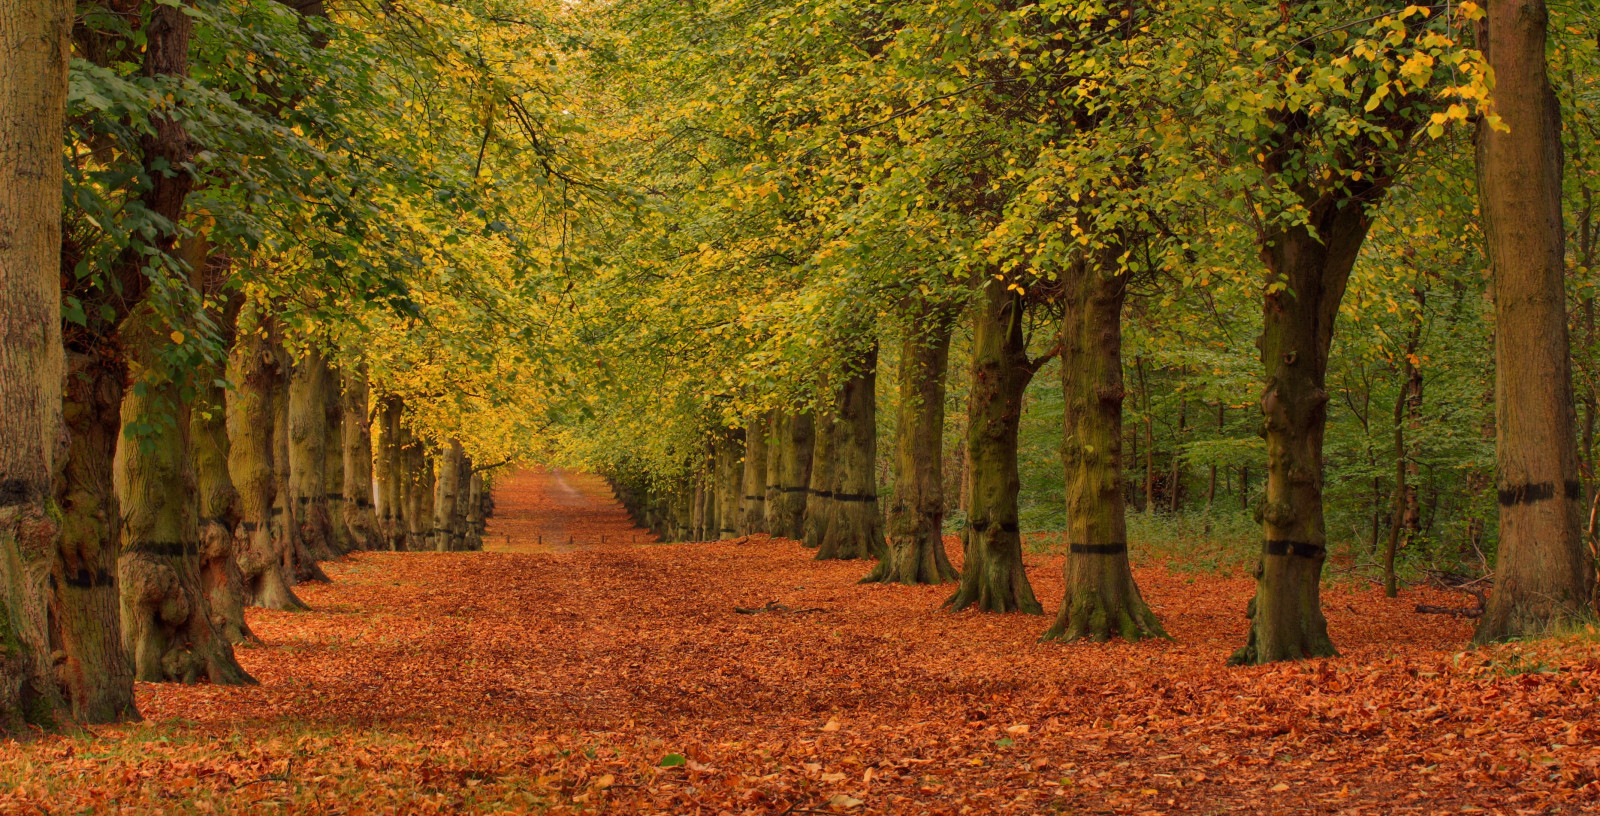 Hd Wallpaper Fall Leaf Change Wallpaper Sunlight Trees Fall Leaves Park England